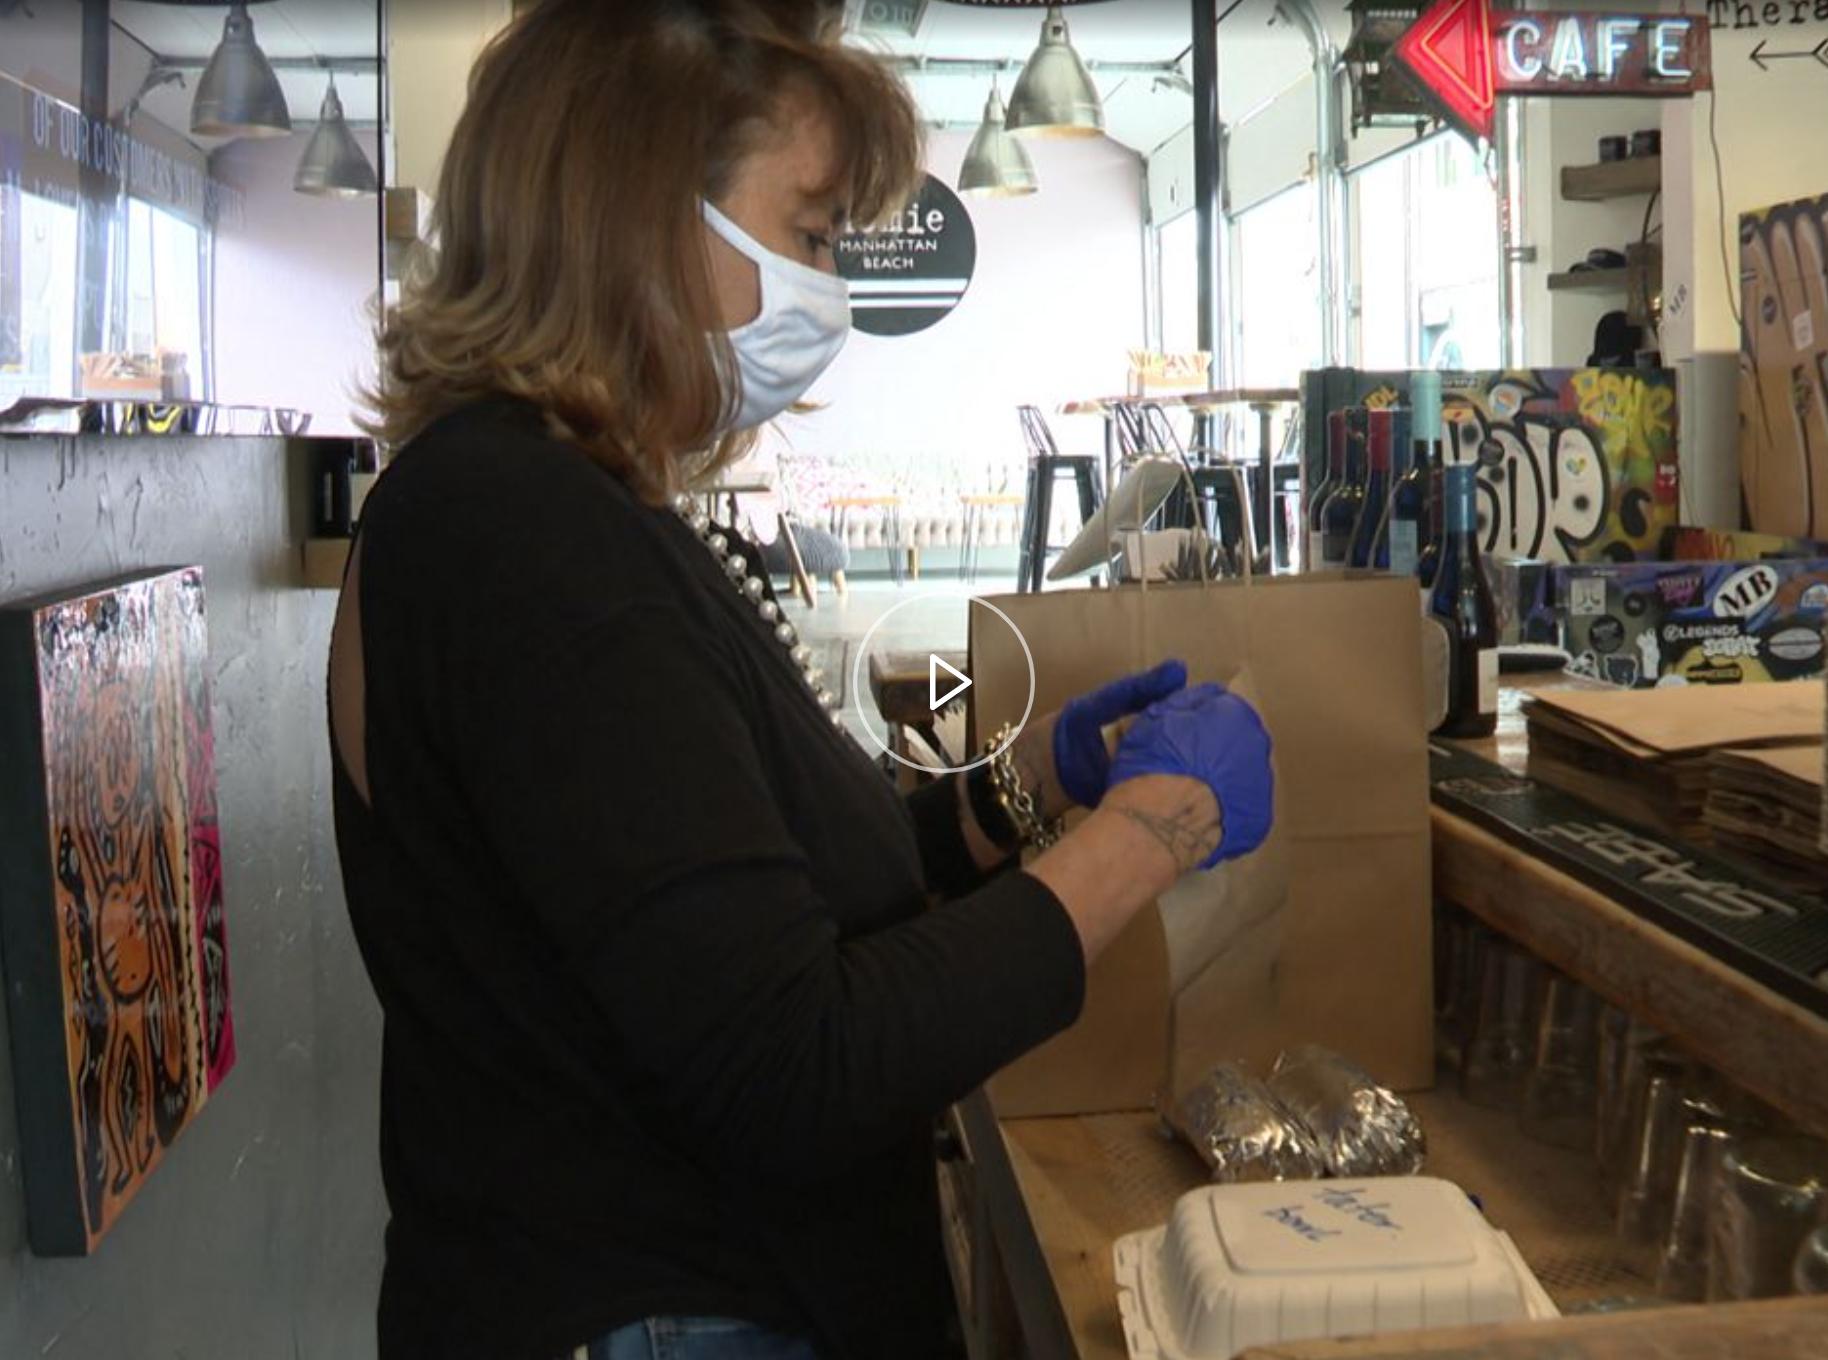 Residents Raise $600K for Manhattan Beach Small Businesses